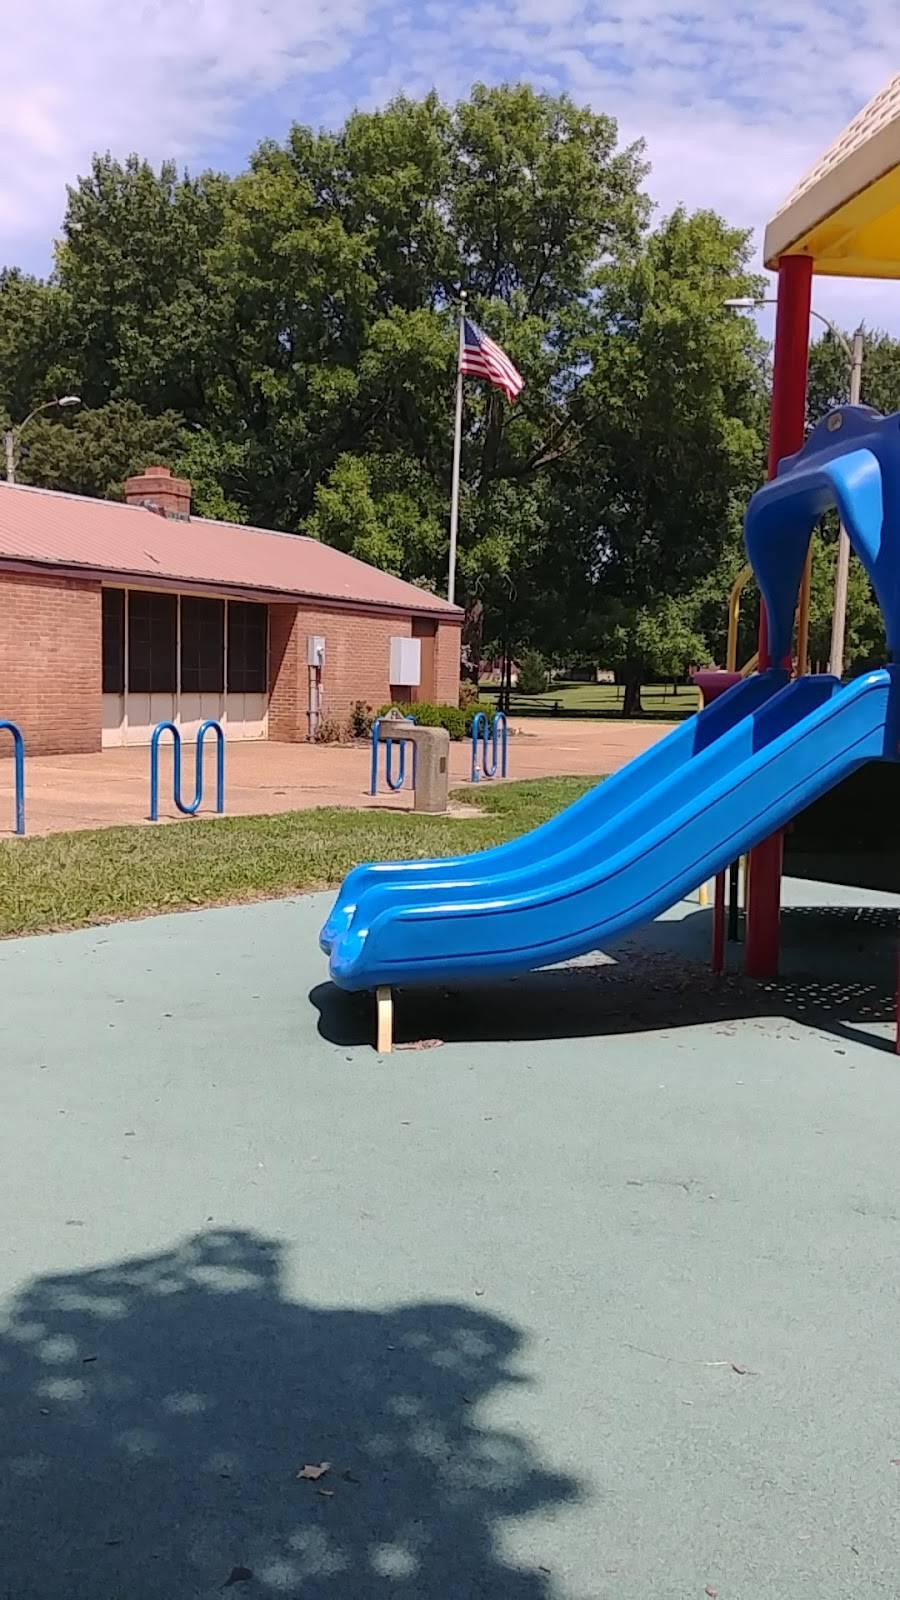 Lindenwood Park - park  | Photo 1 of 10 | Address: Pernod Ave & Jamieson Avenue, St. Louis, MO 63139, USA | Phone: (314) 622-4800